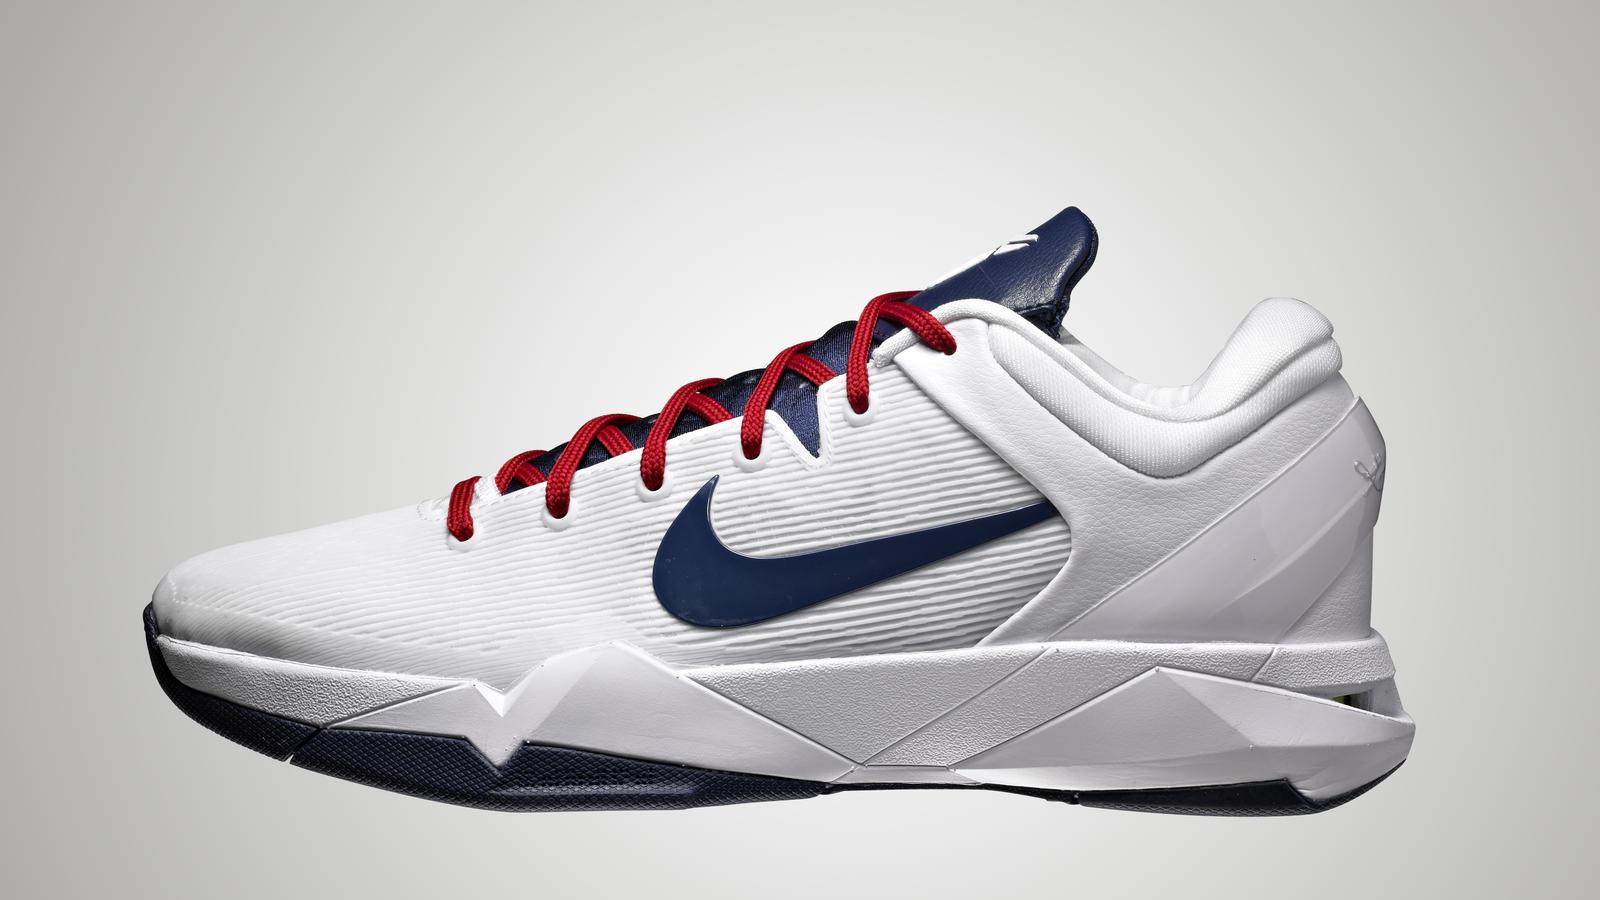 24/7 customer service · brand new rewards program · new arrivals USA Men's Basketball Team Members Debut NIKEiD Shoes ...